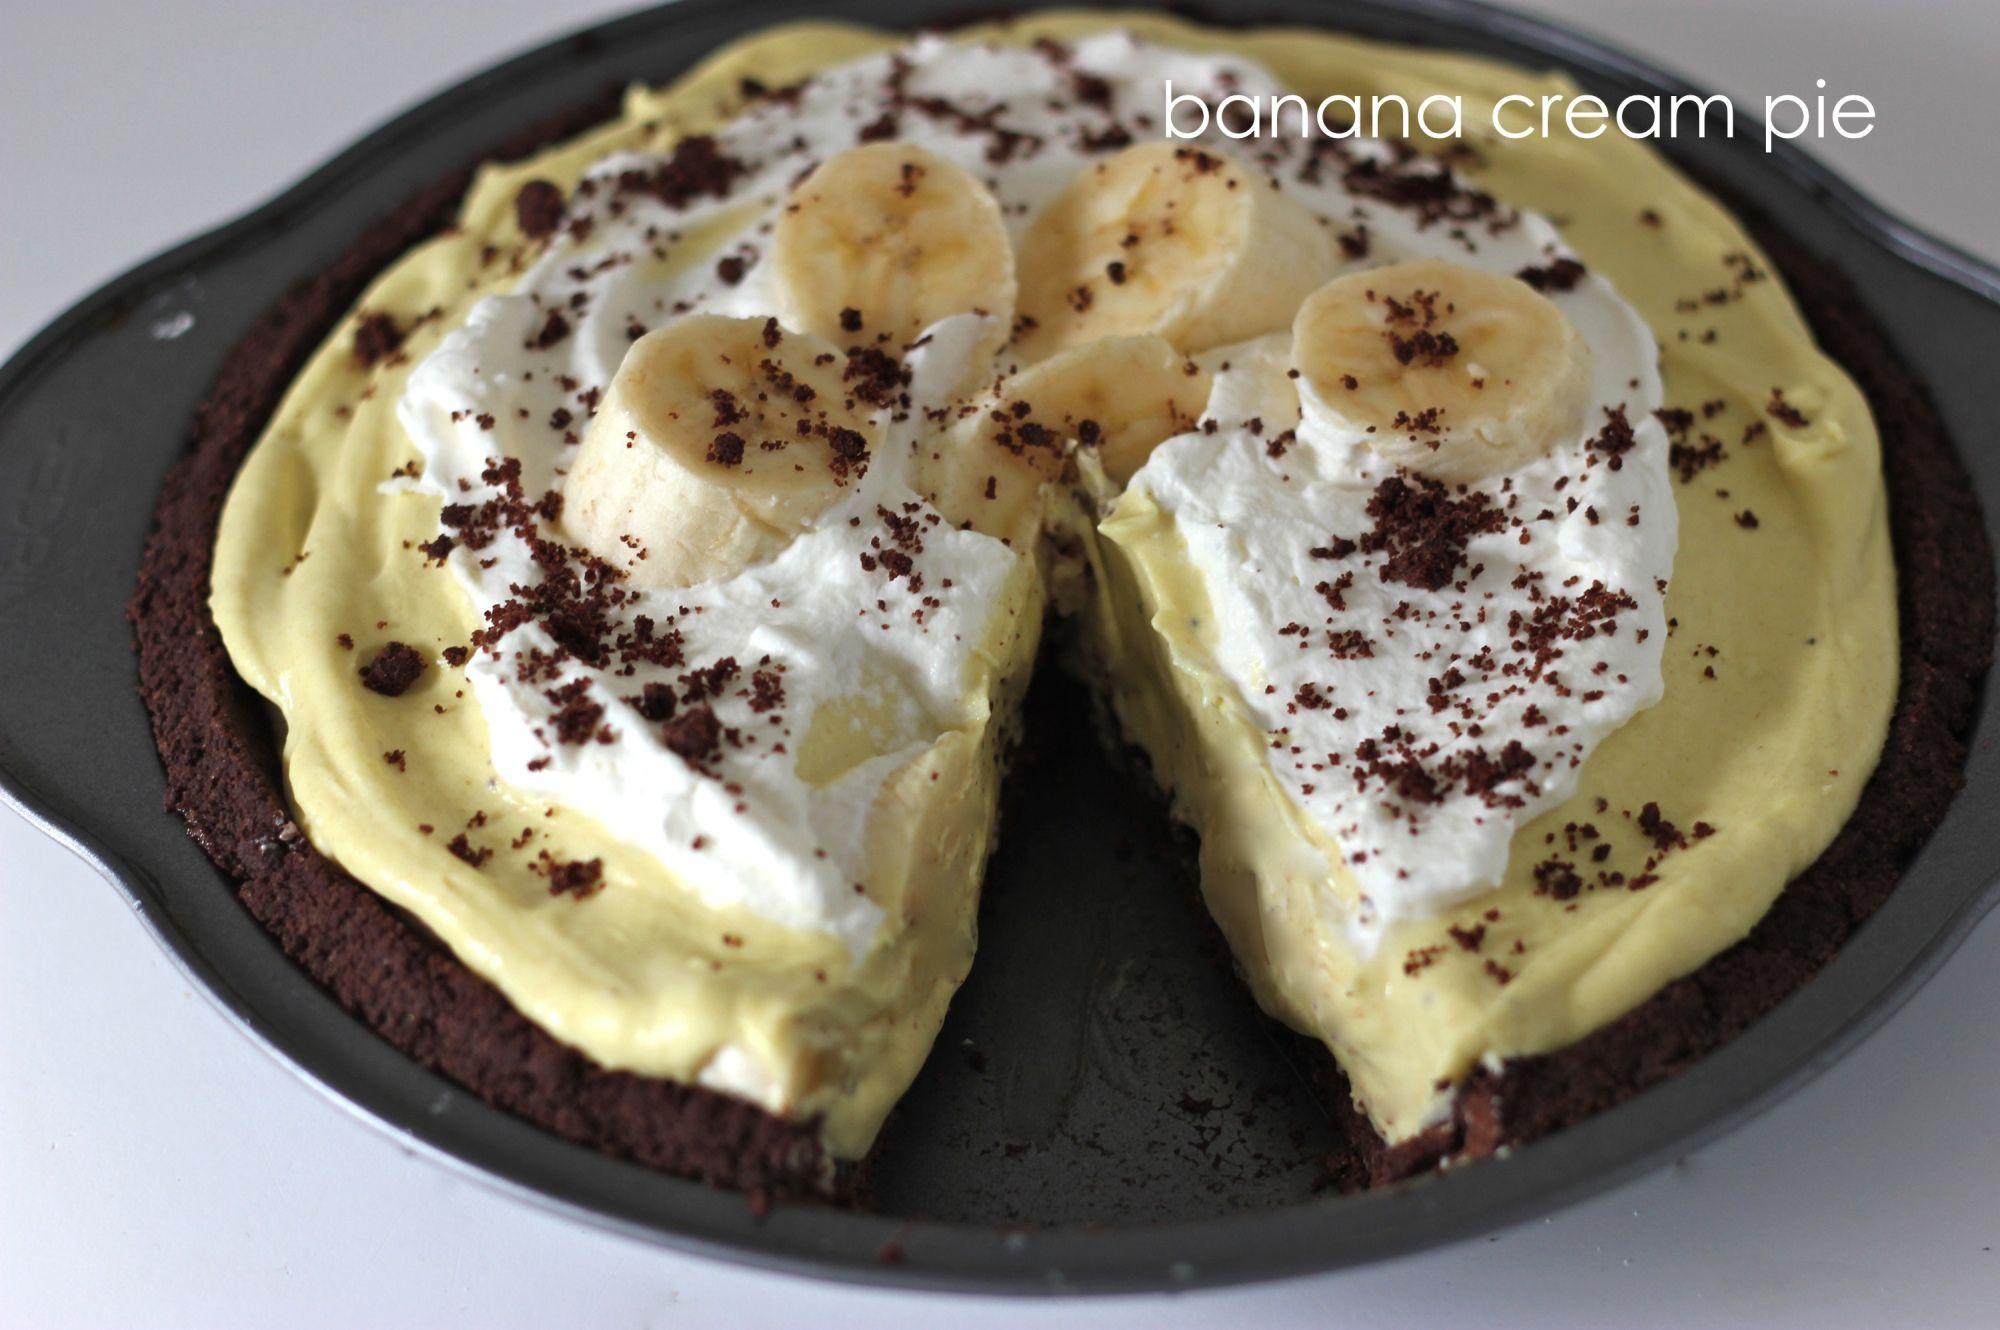 bananacreampie1